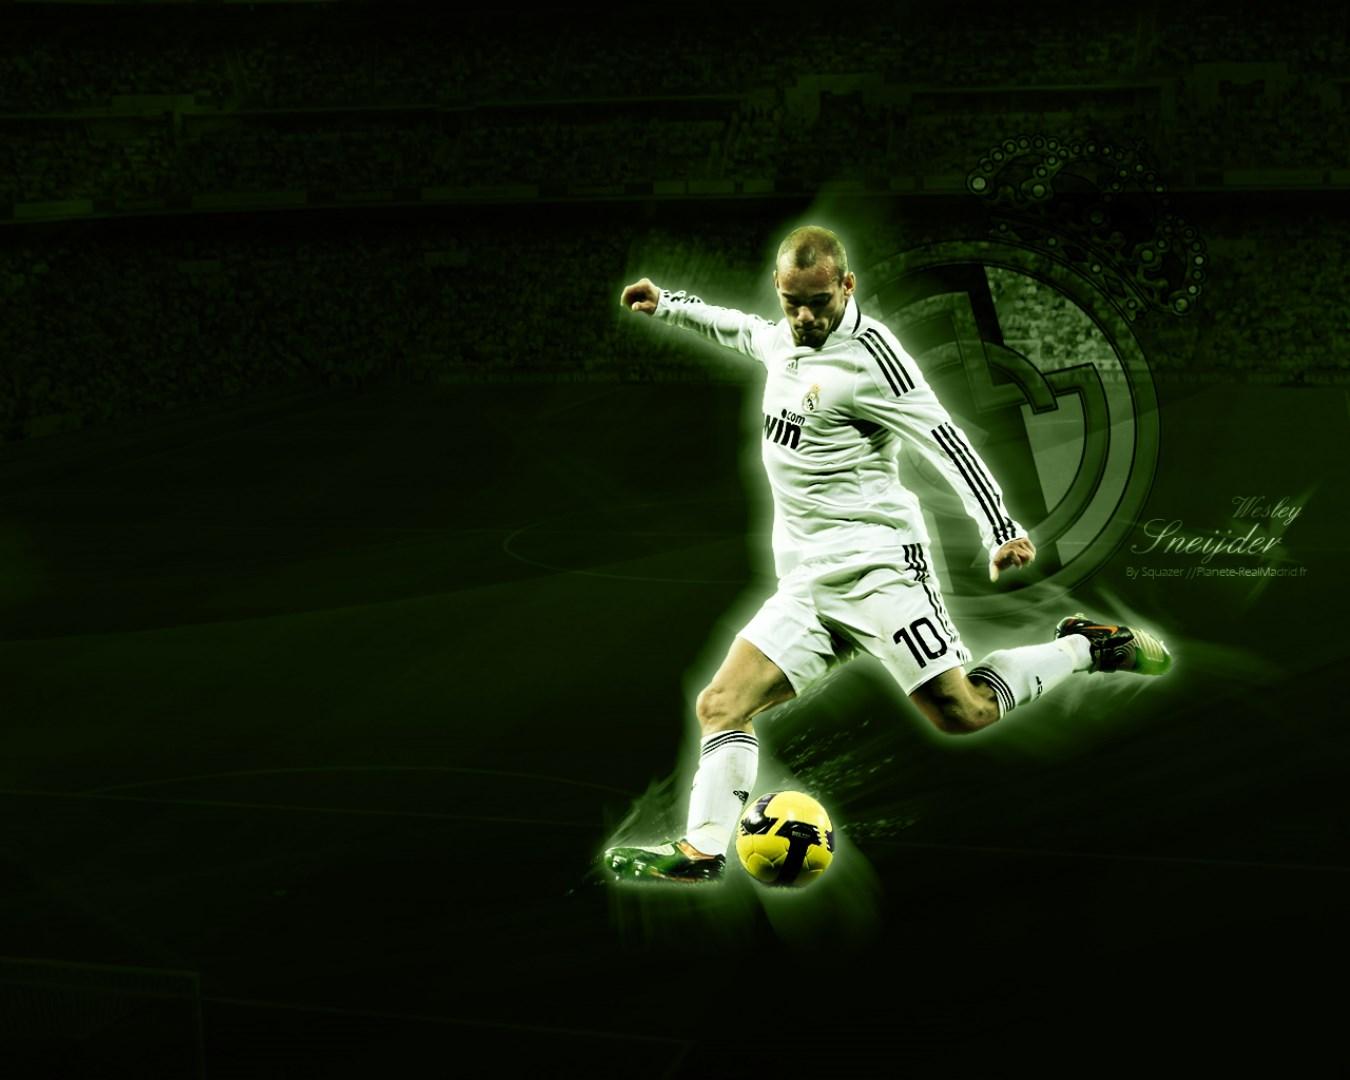 wesley+sneijder+galatasaray+resimleri+rooteto+25 Wesley Sneijder Galatasaray HD Resimleri